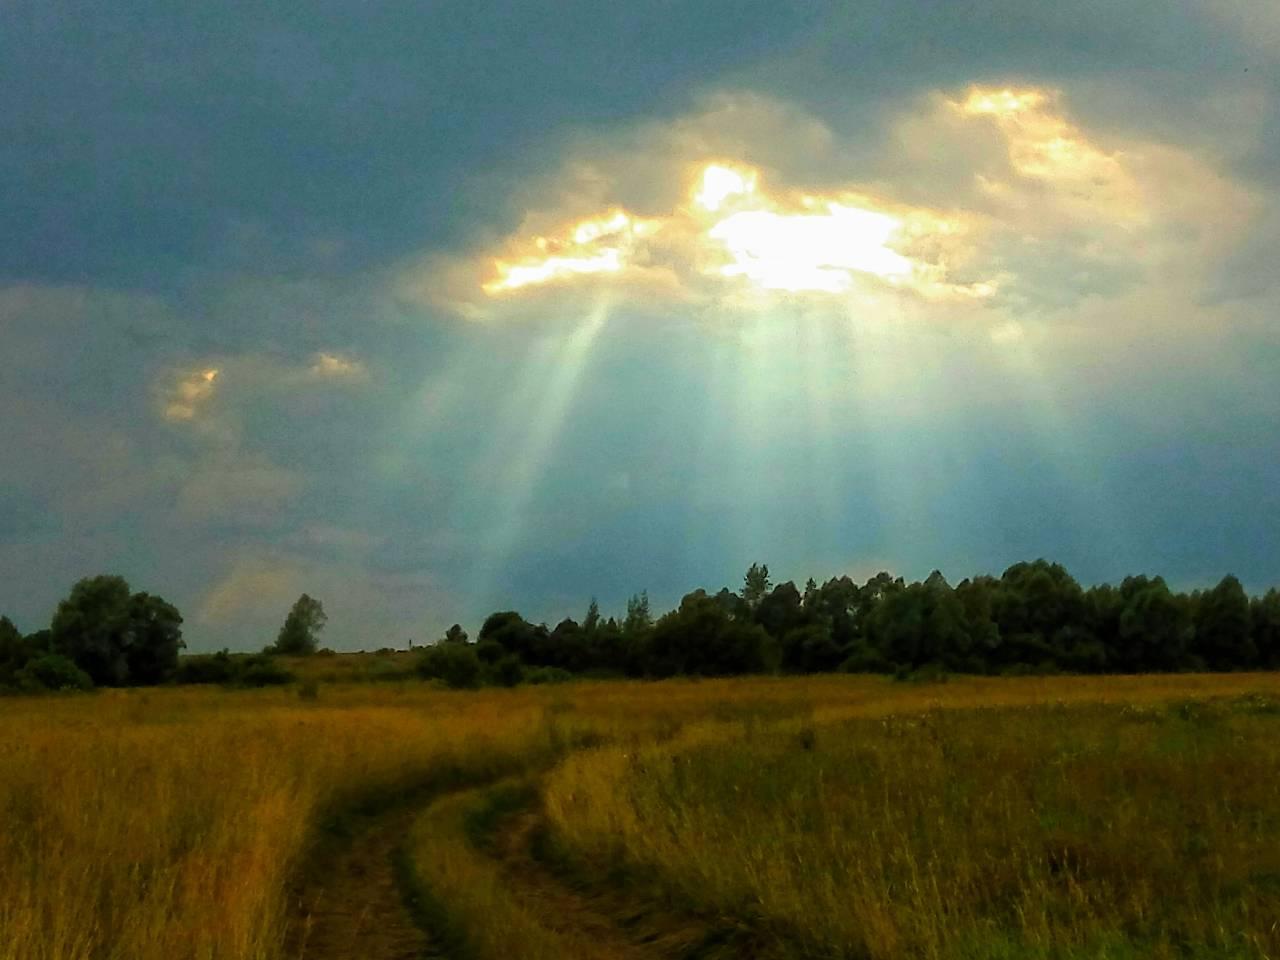 лучи солнца сквозь грозовые тучи фотографія Sergei